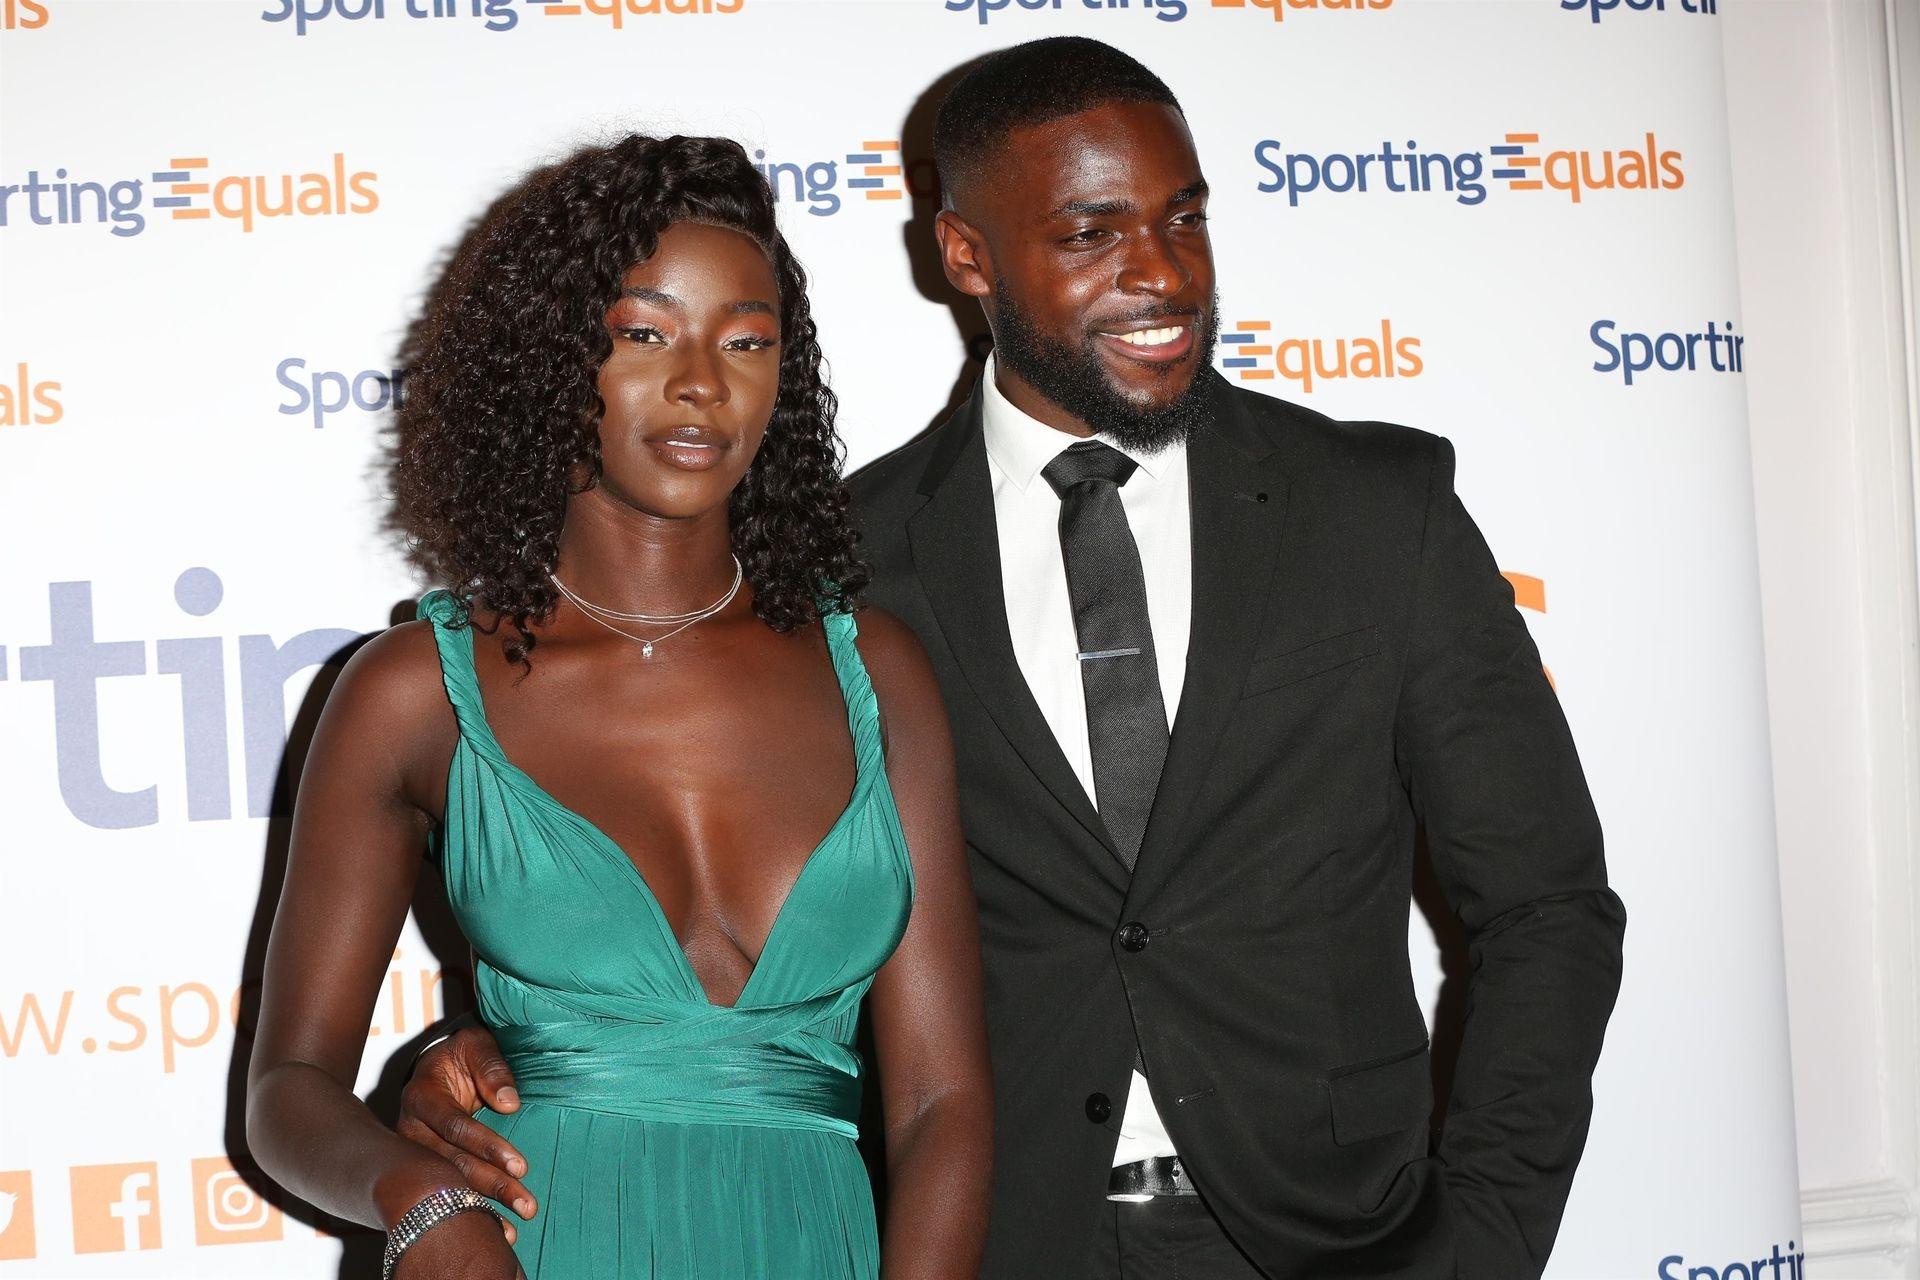 Mike Boateng & Priscilla Anyabu Are Seen At British Ethnic Diversity Sports Awards 0089